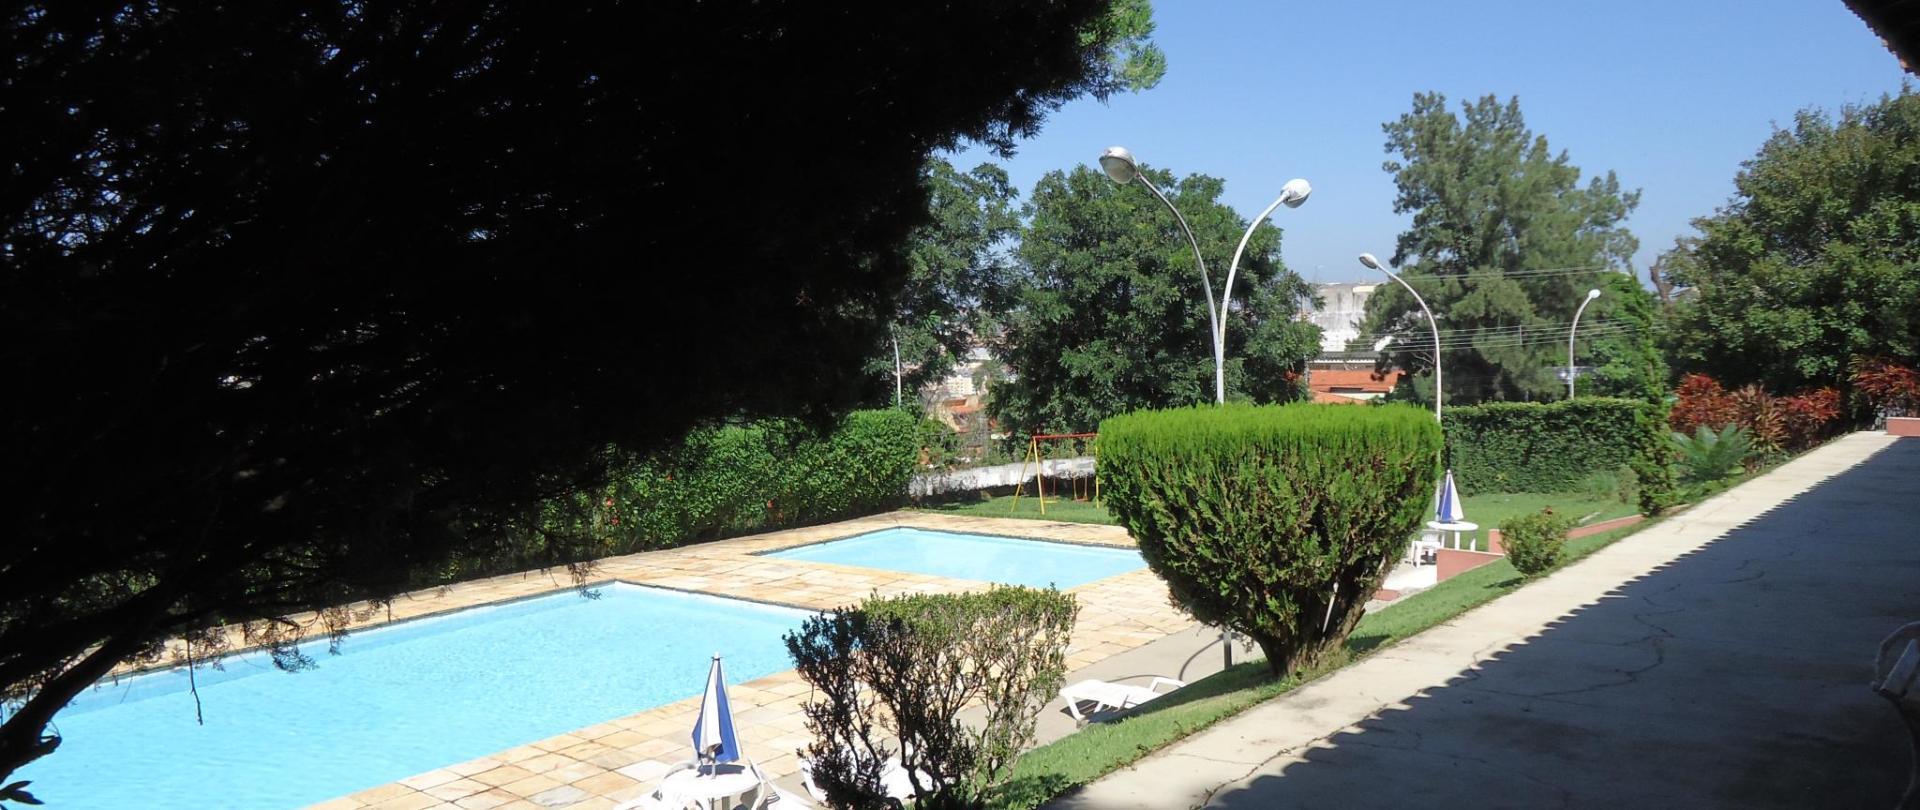 Grande Hotel Atibaia